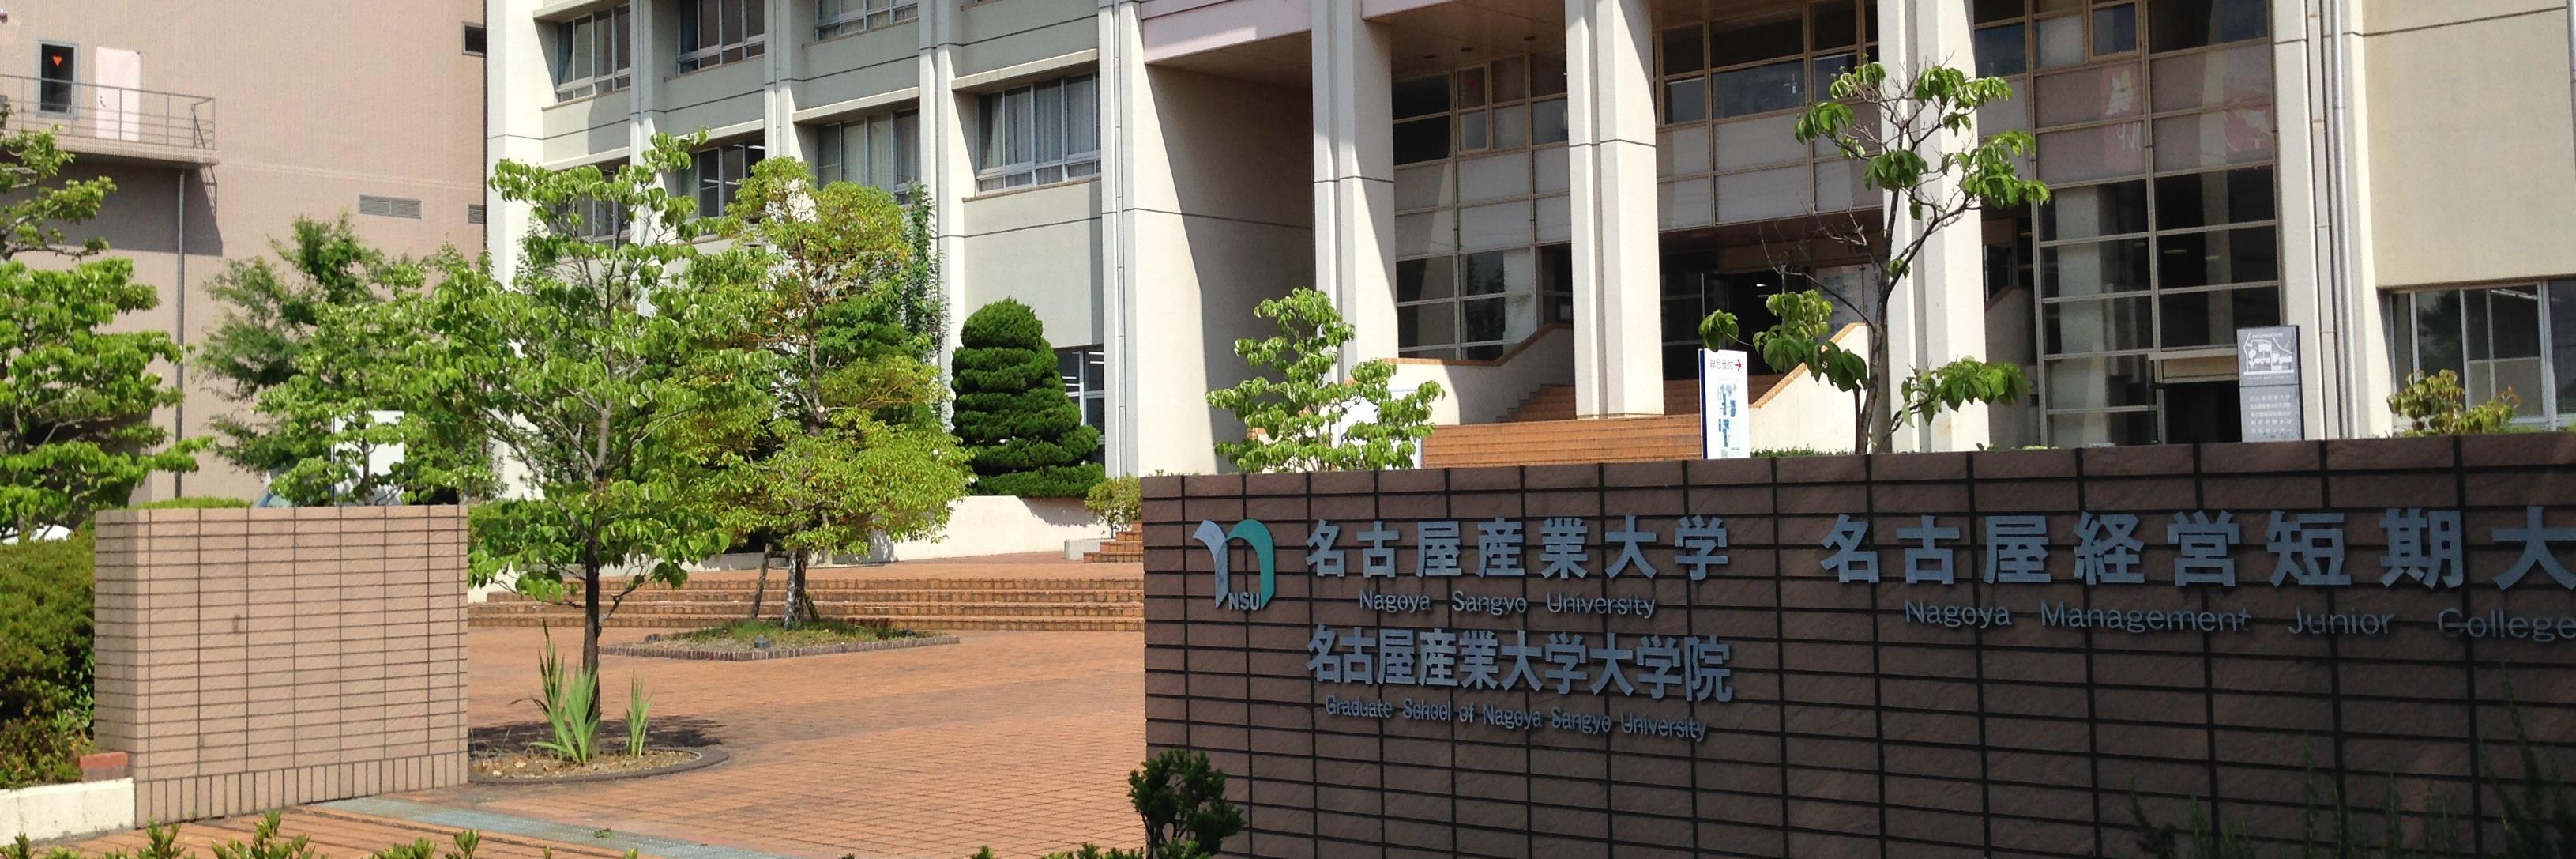 Nagoya Sangyo University's official Twitter account